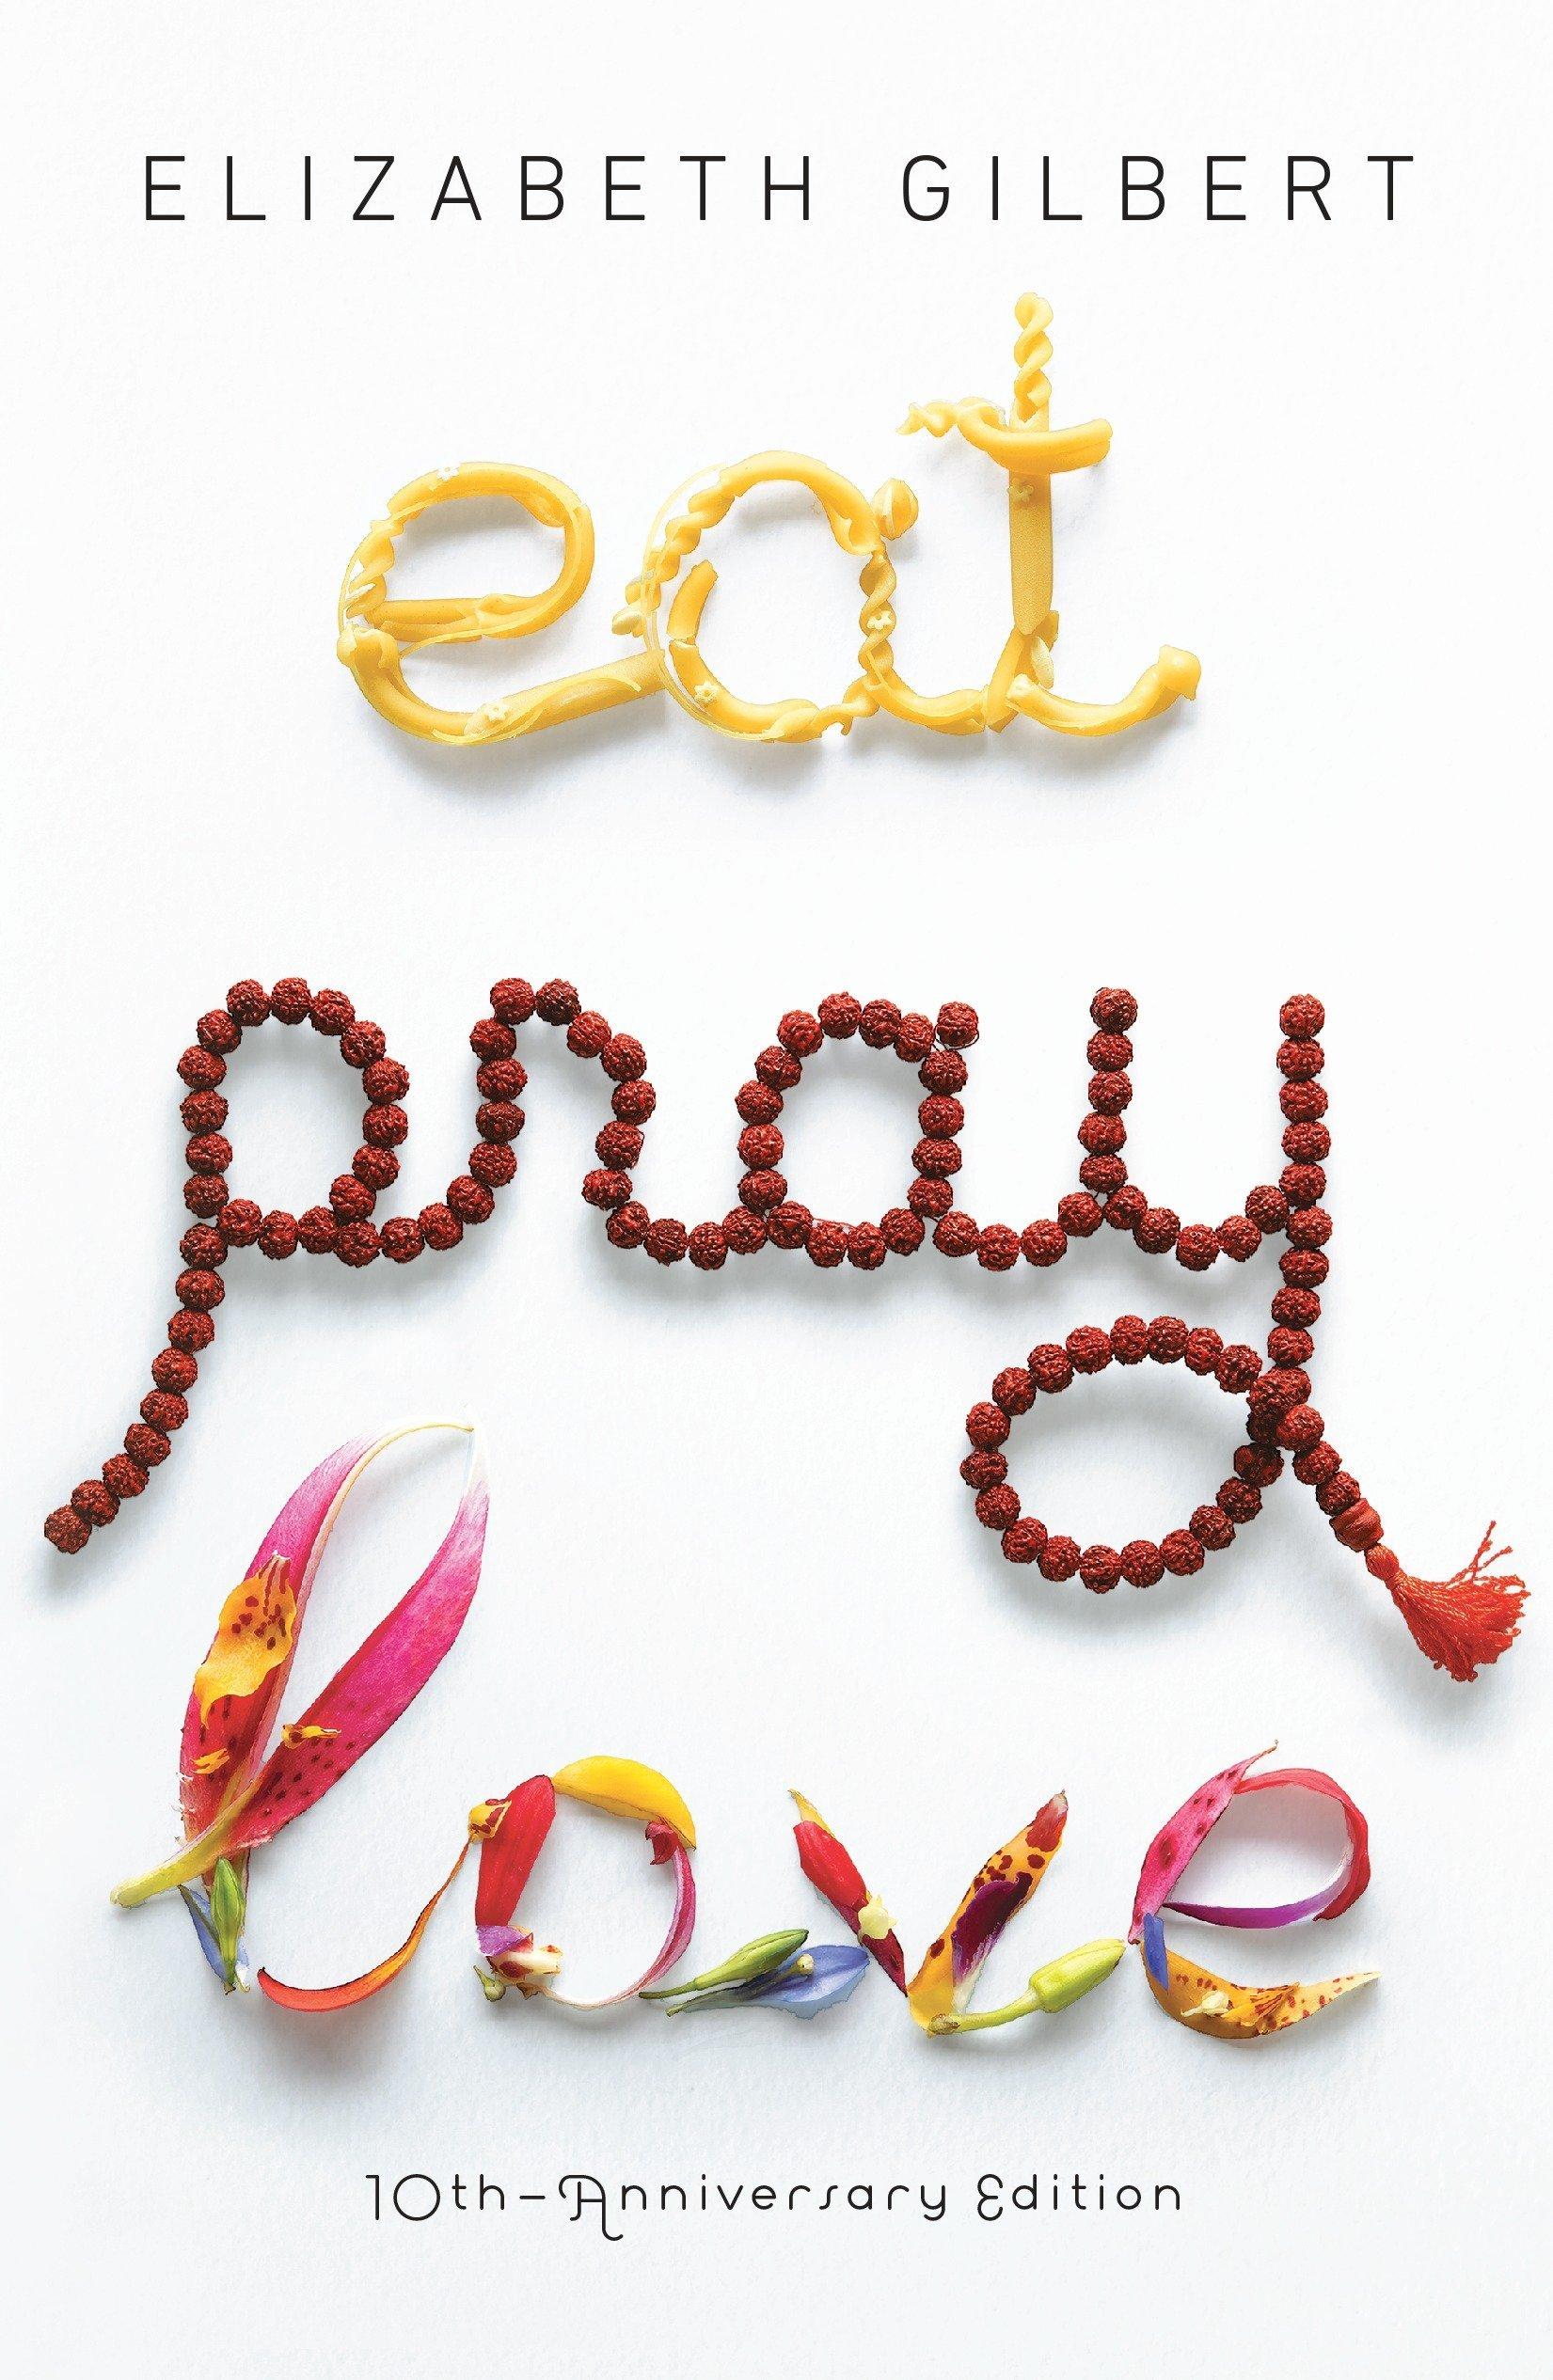 eat pray love by elizabeth gilbert.jpg